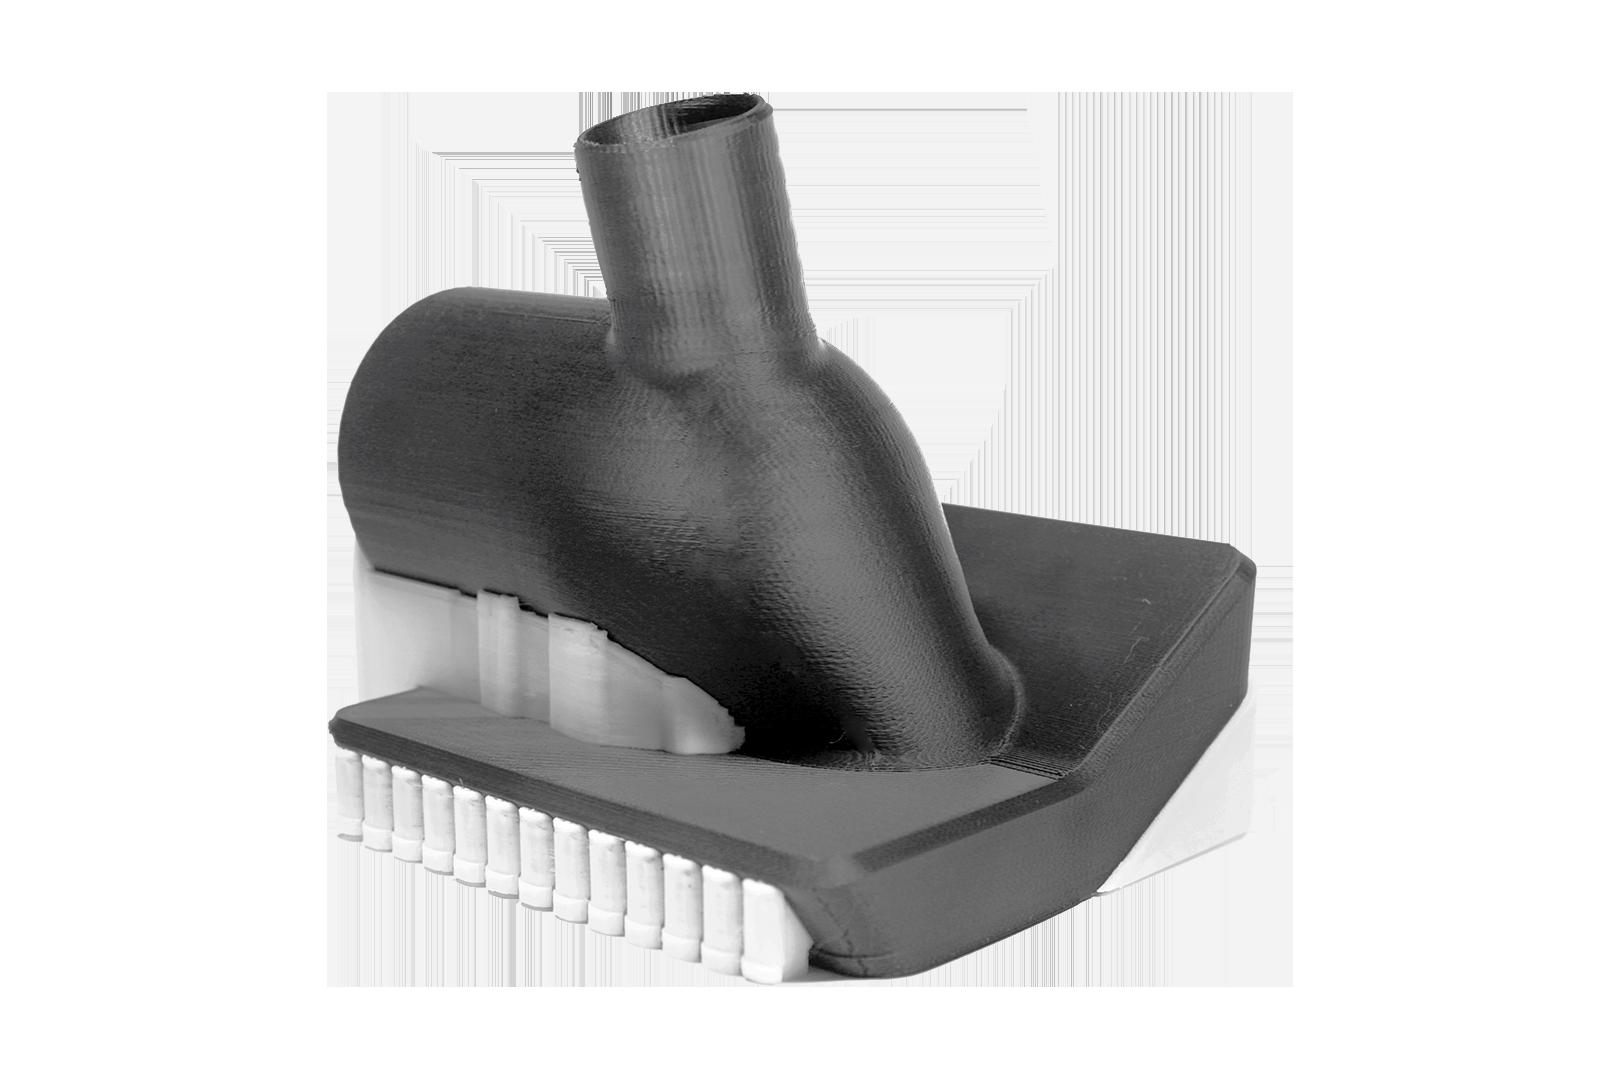 makerbot materiál abs černá